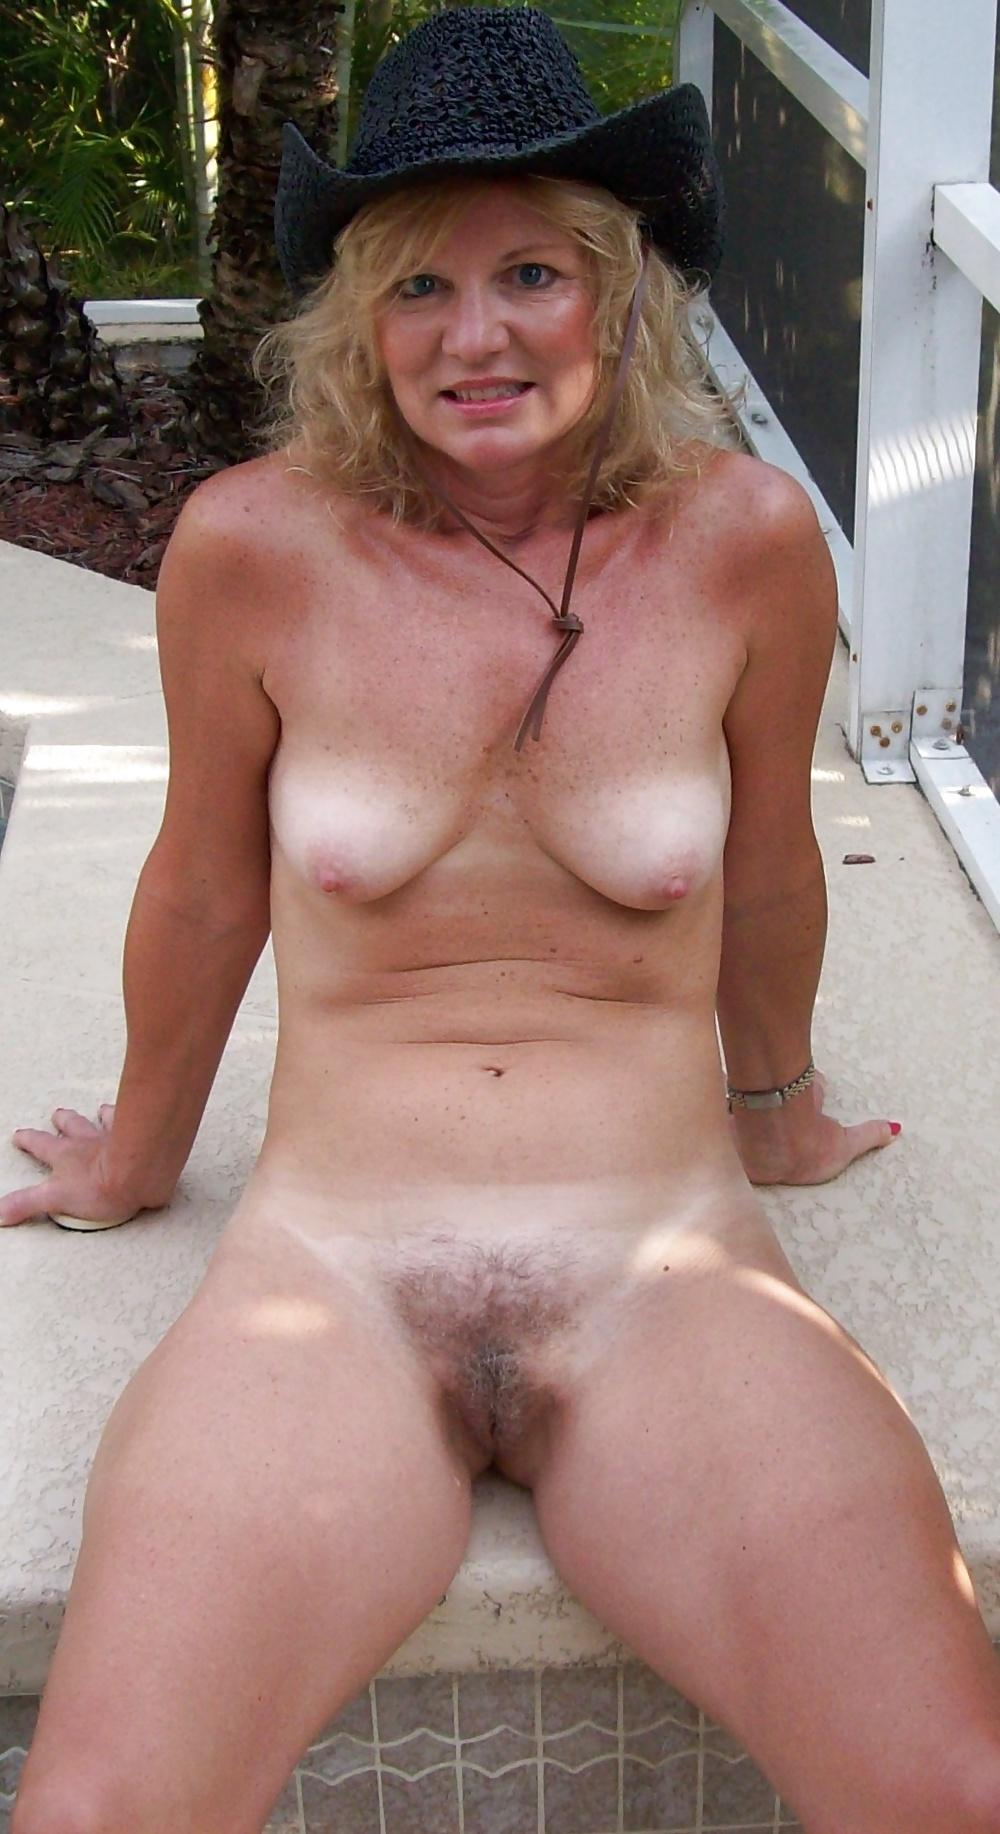 Pee interracial girl stepdad